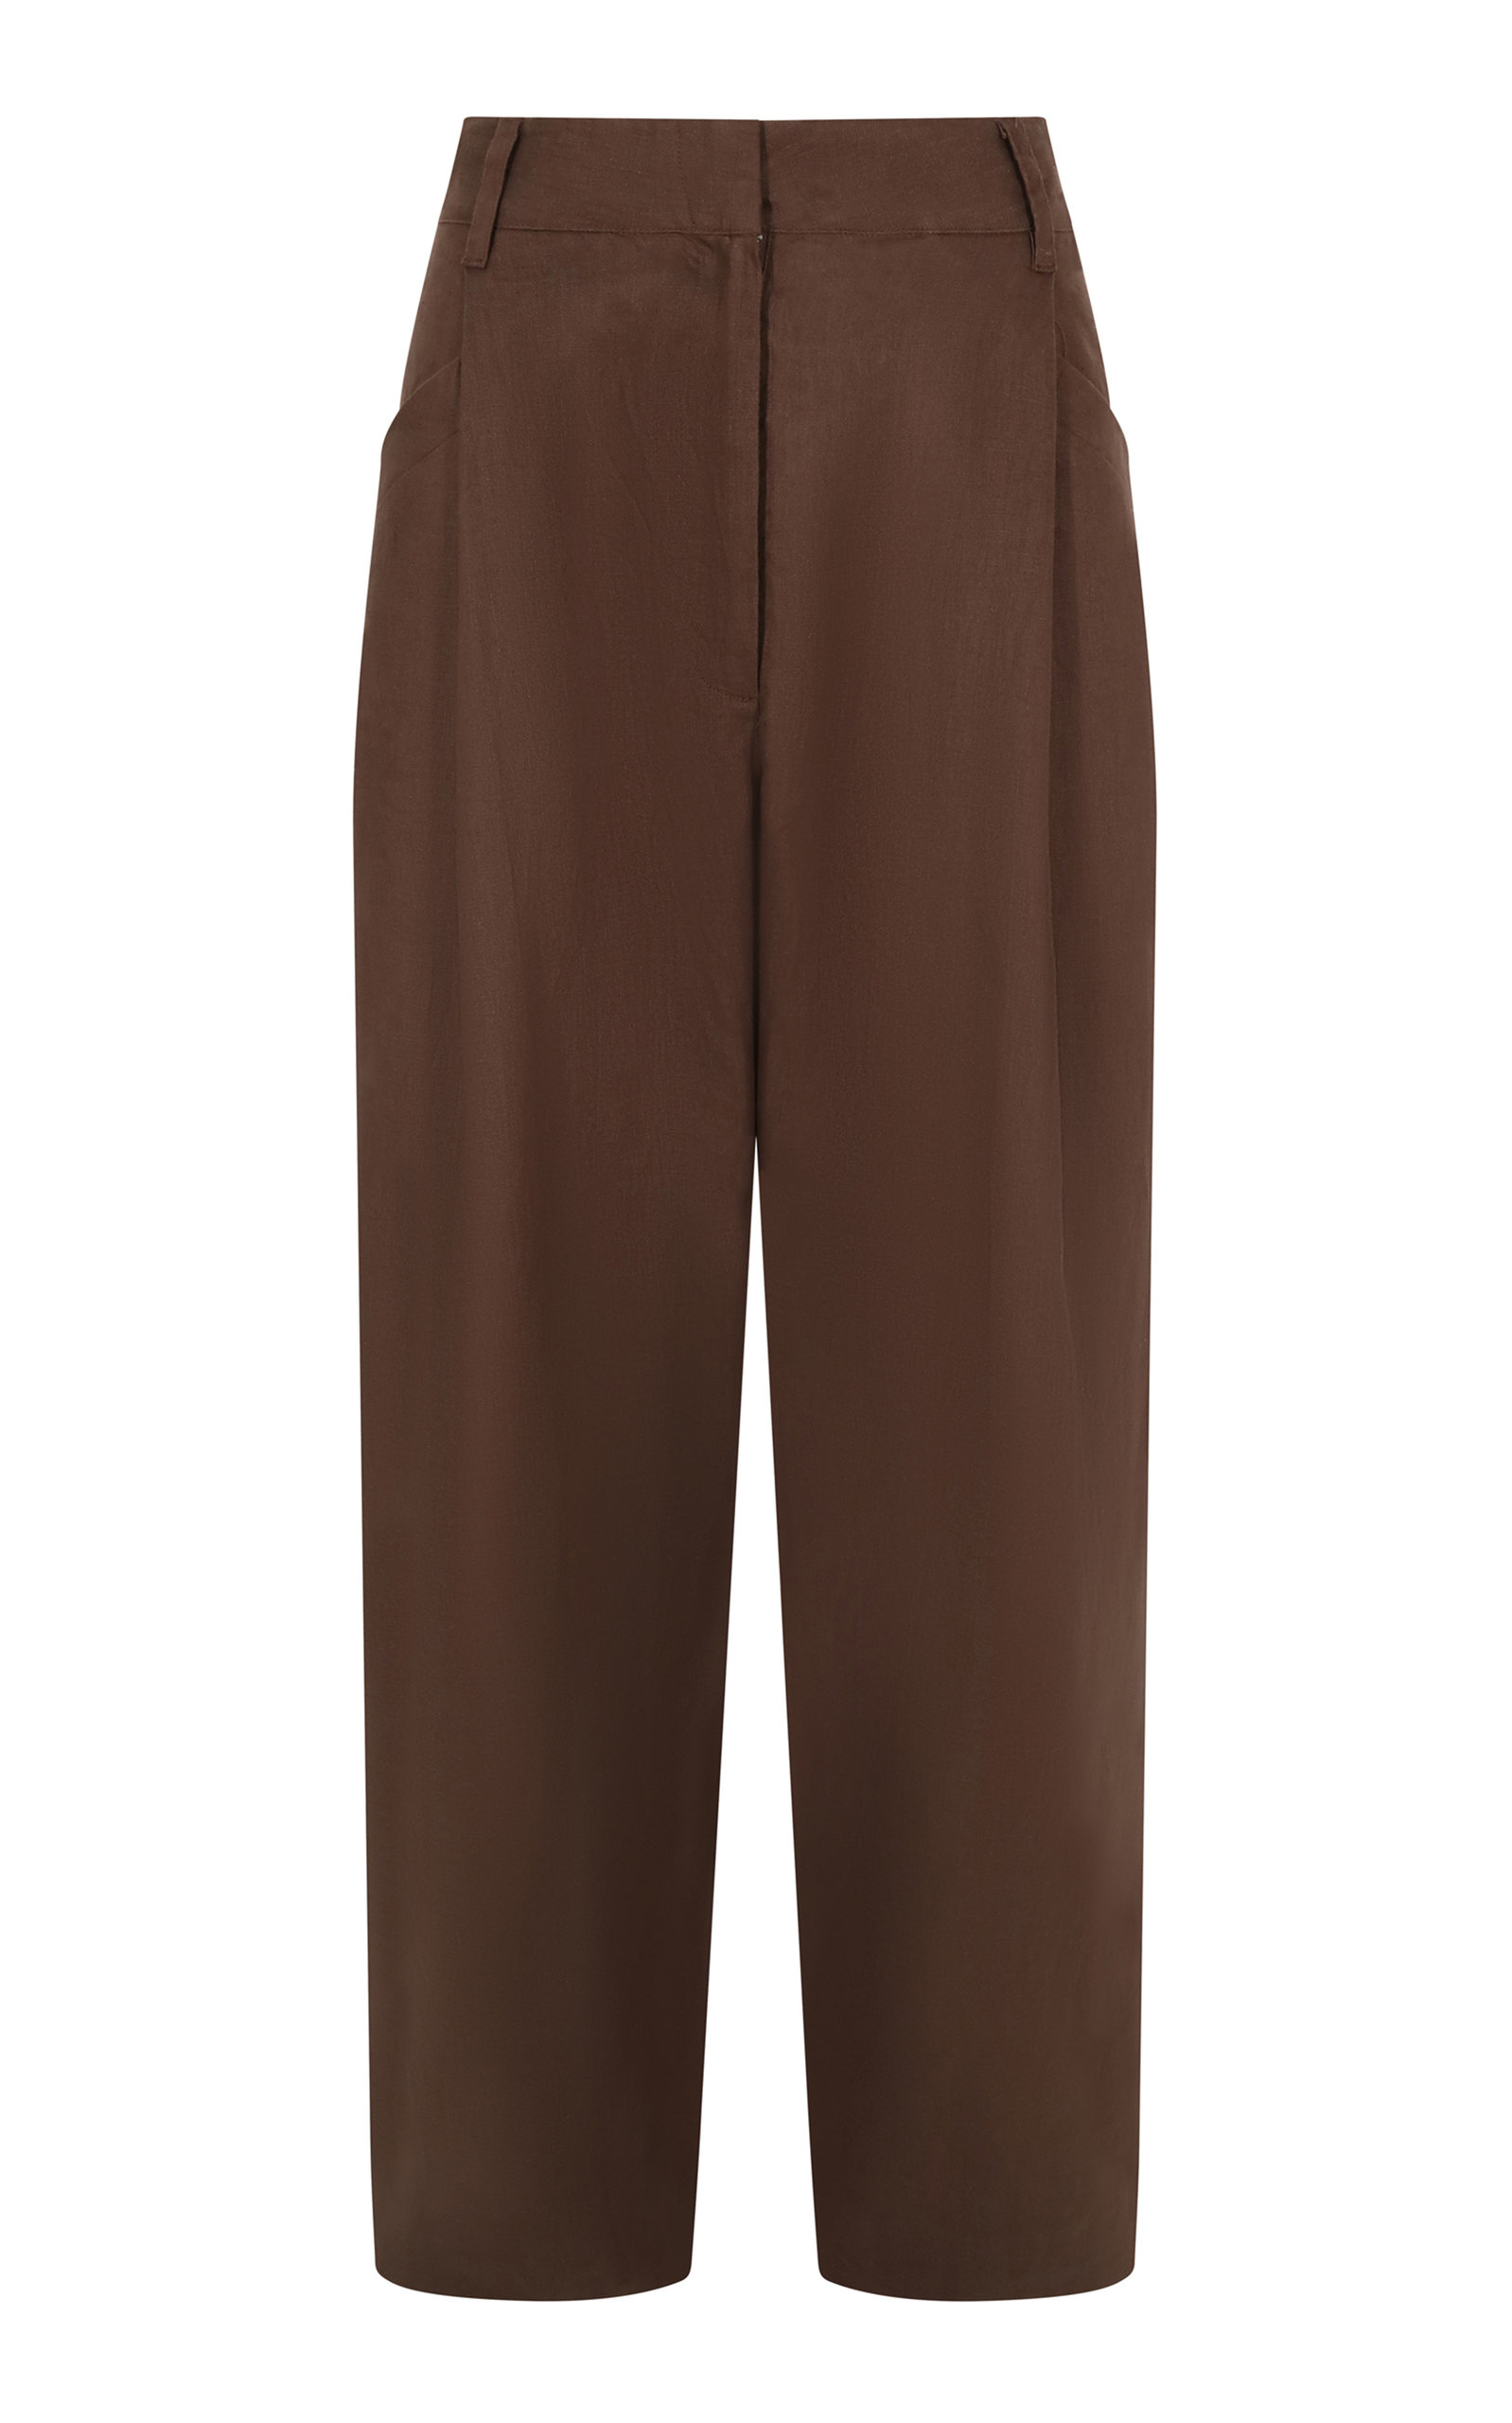 Women's Pleated Linen Straight-Leg Trousers